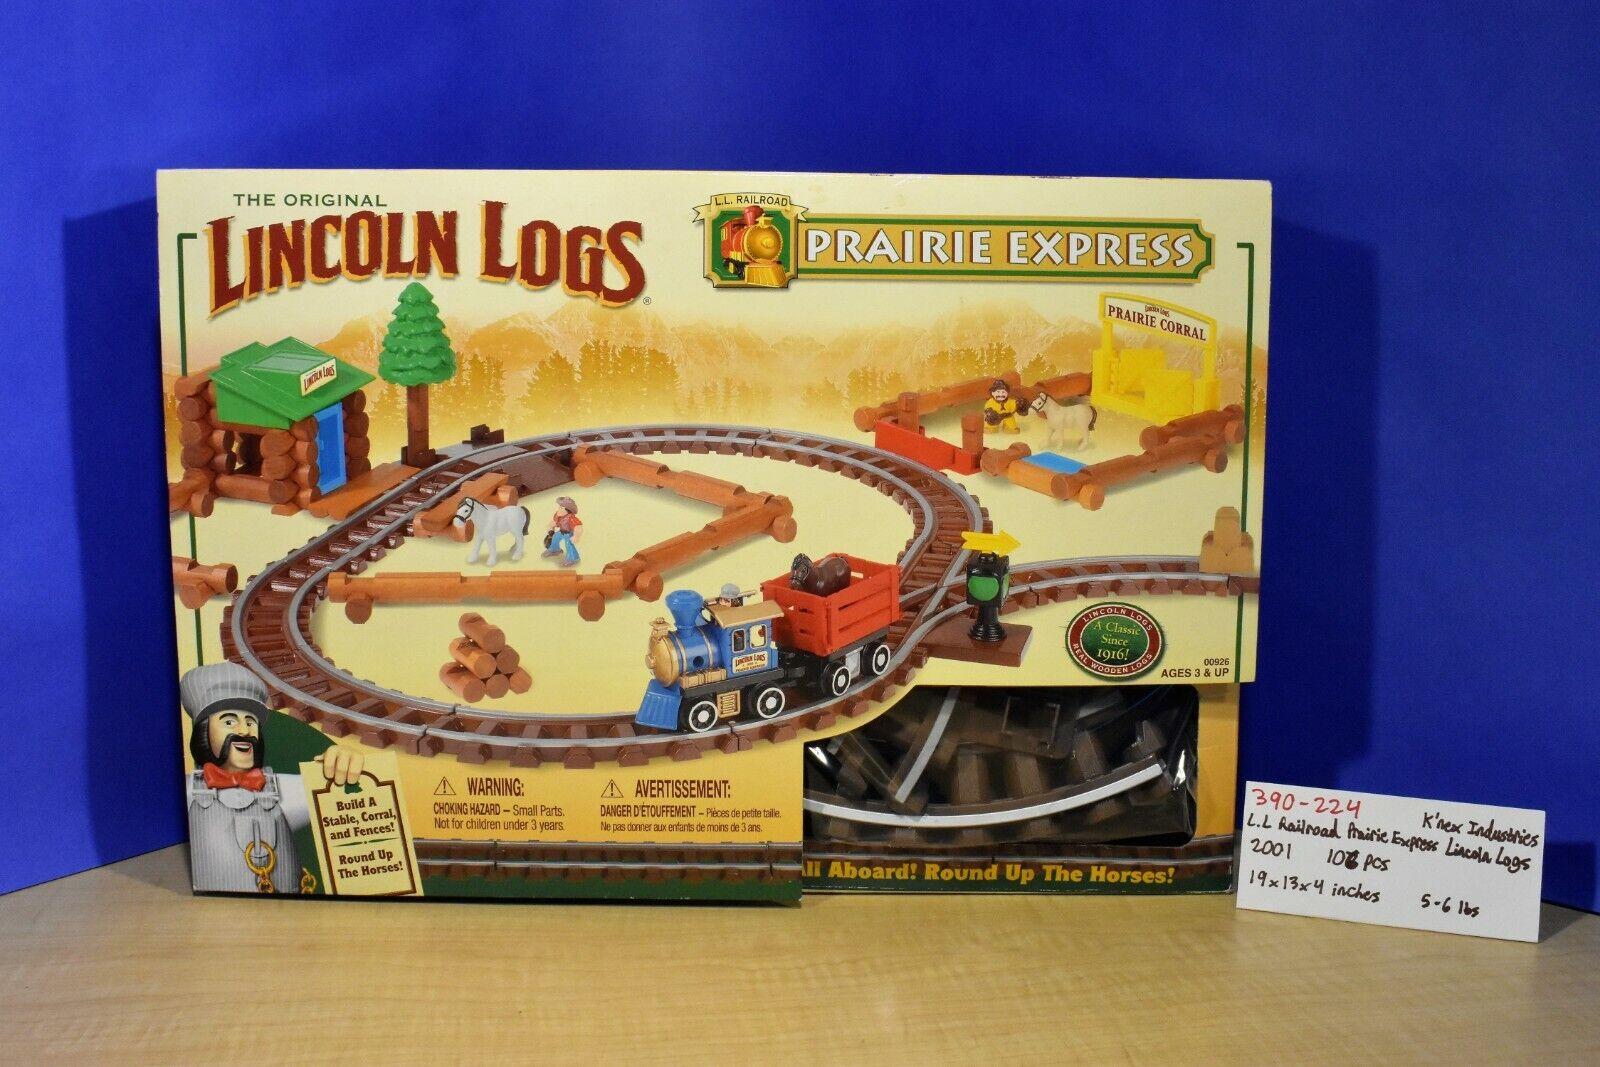 K'nex K'nex K'nex 2001 The Original Lincoln Logs Prairie Express Lincoln Logs (390-224) 10b064